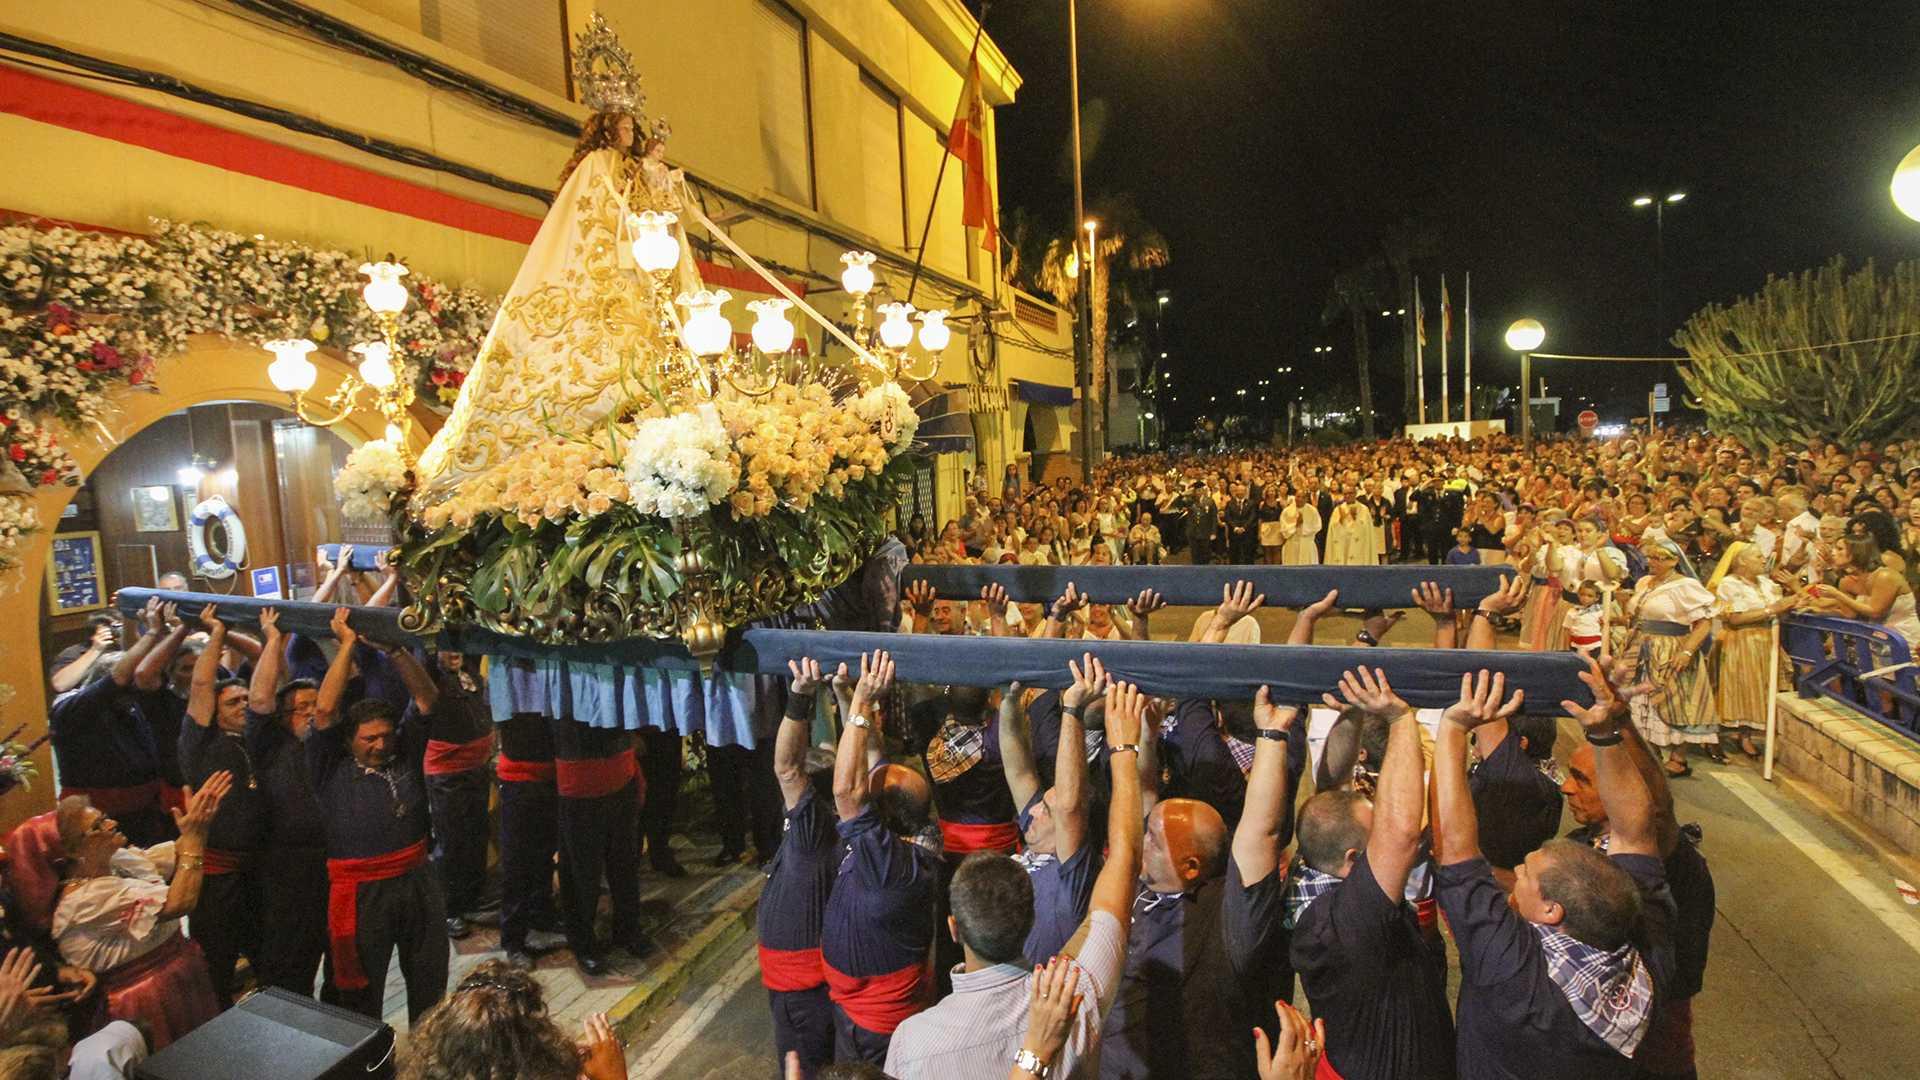 Festivities in honour of the Virgen del Carmen